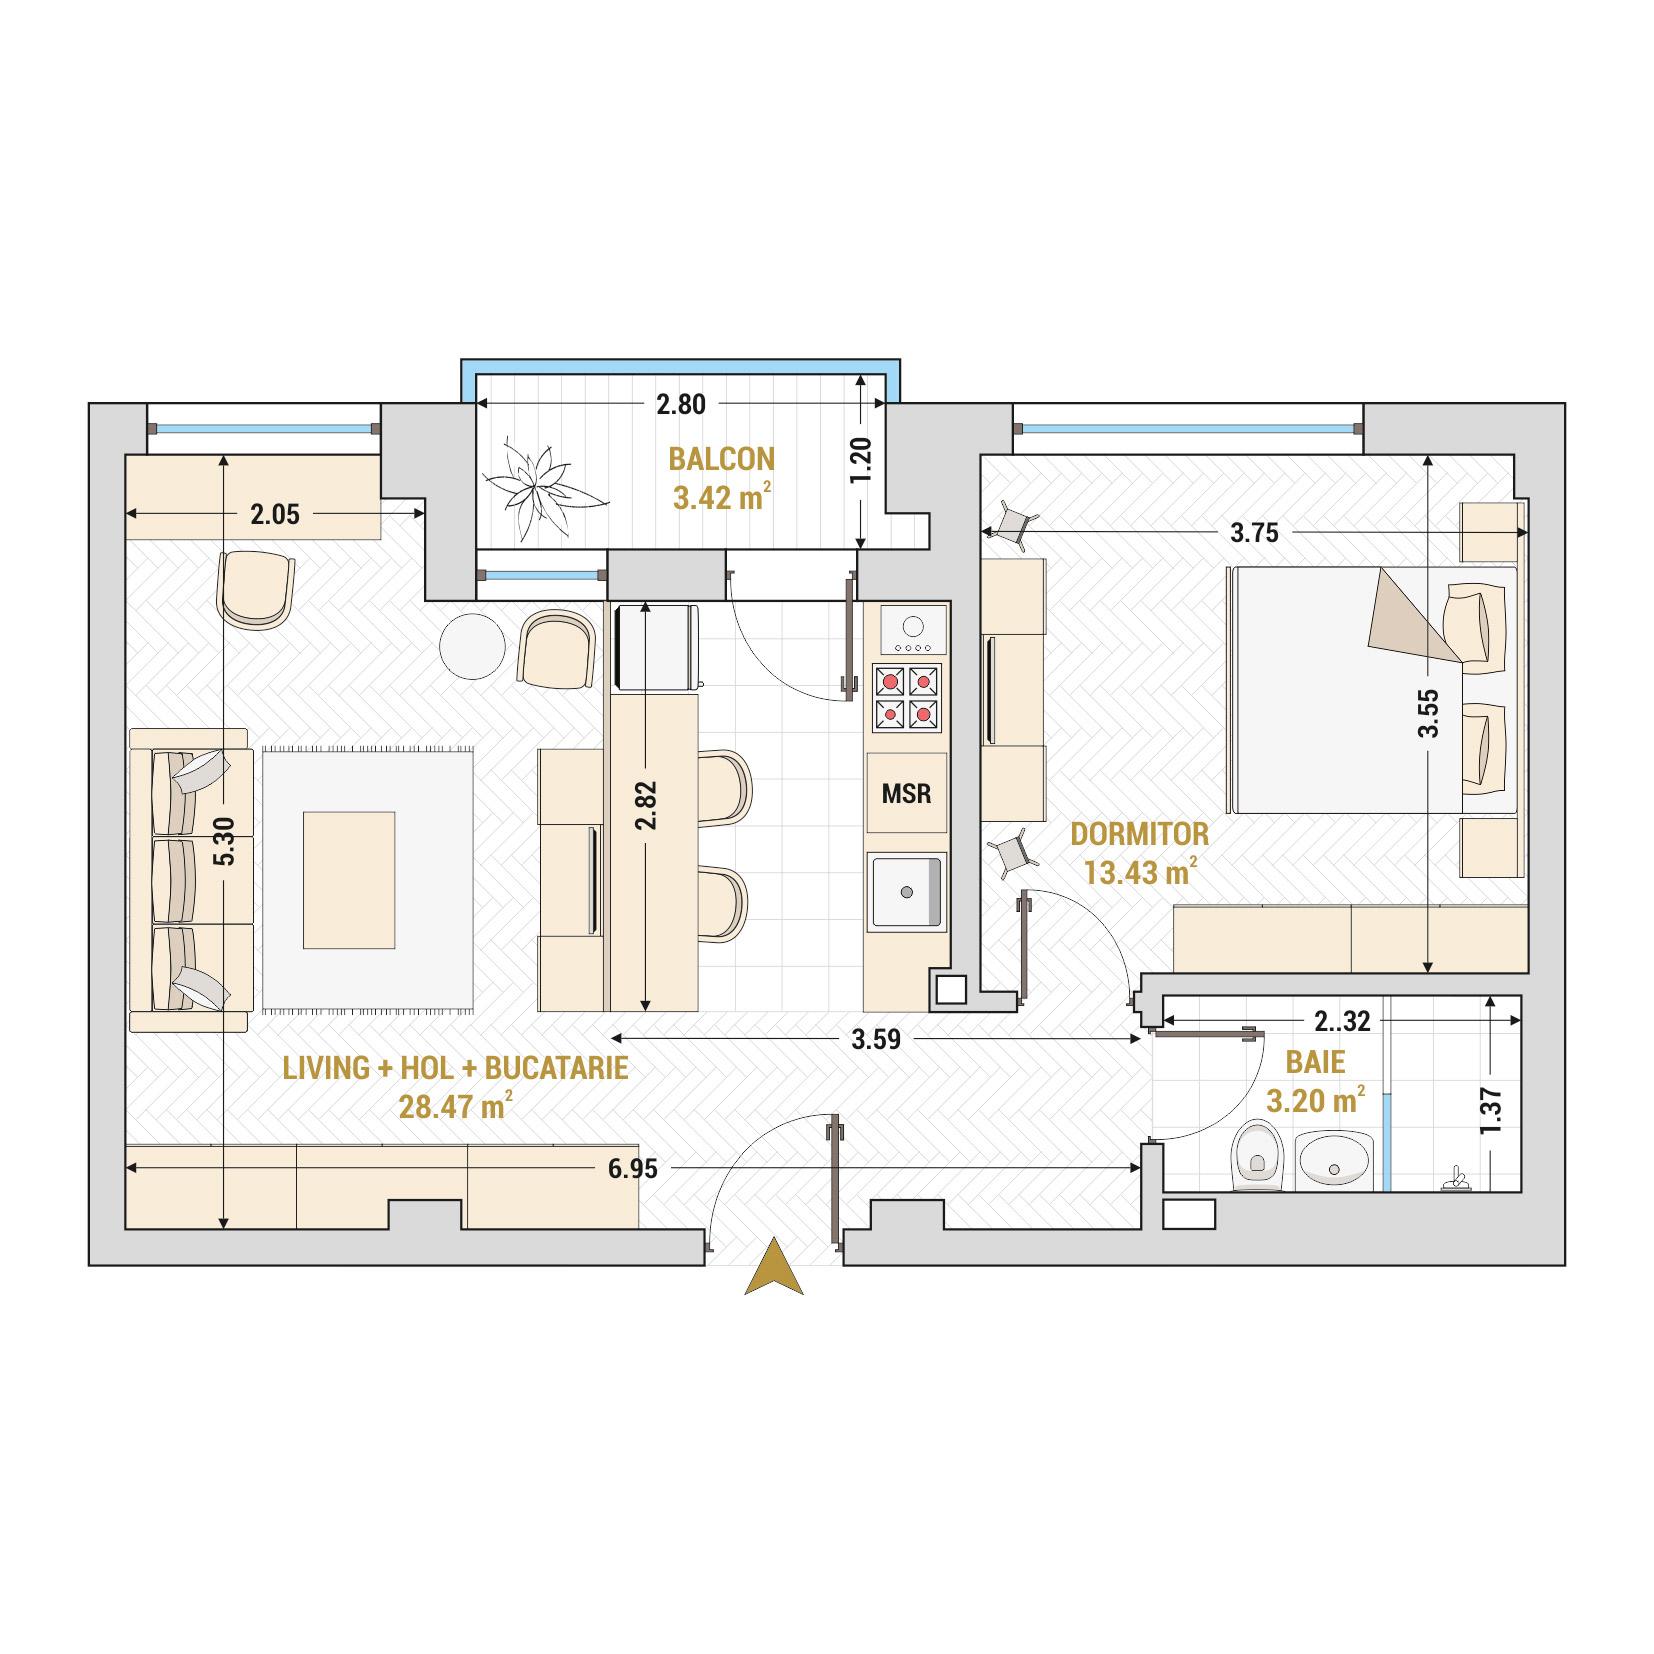 Apartamente cu 2 camere de vanzare Bucuresti - Catedral Residence - Marriott, Piata Unirii, 13 Septembrie, Izvor - Tip 1 - T1A